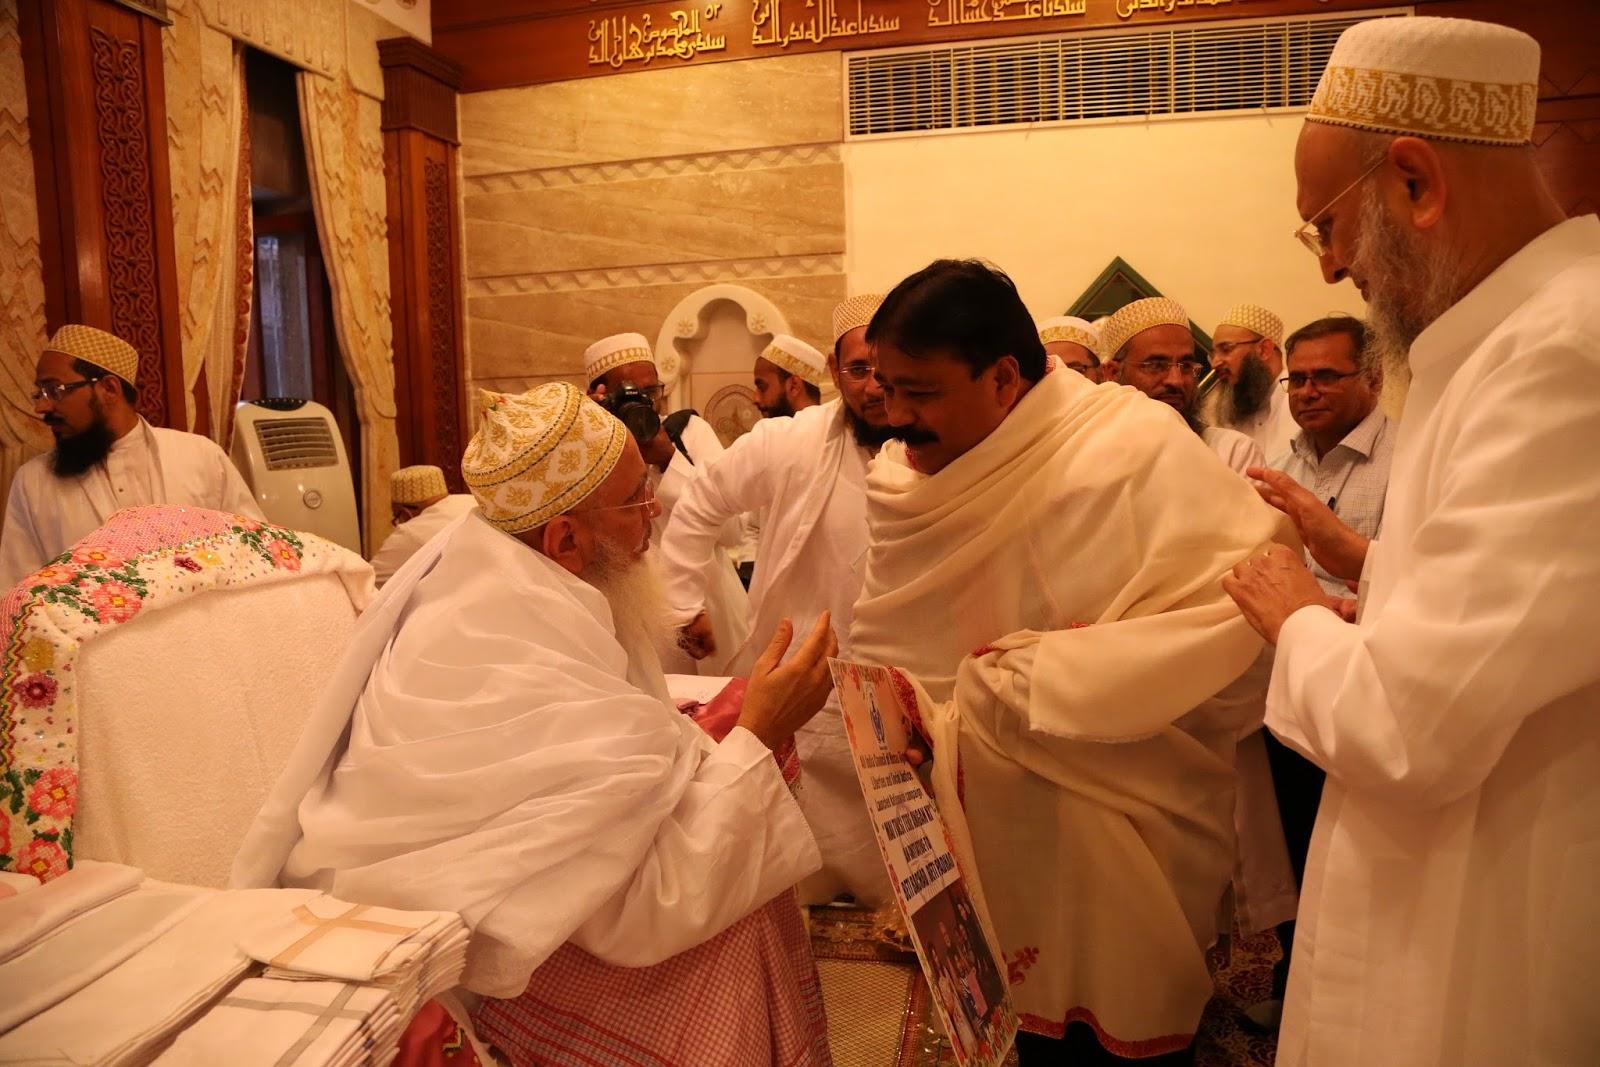 His Holiness Dr  Syedna Aali Qadr Mufaddal Saifuddin TUS, the 53rd